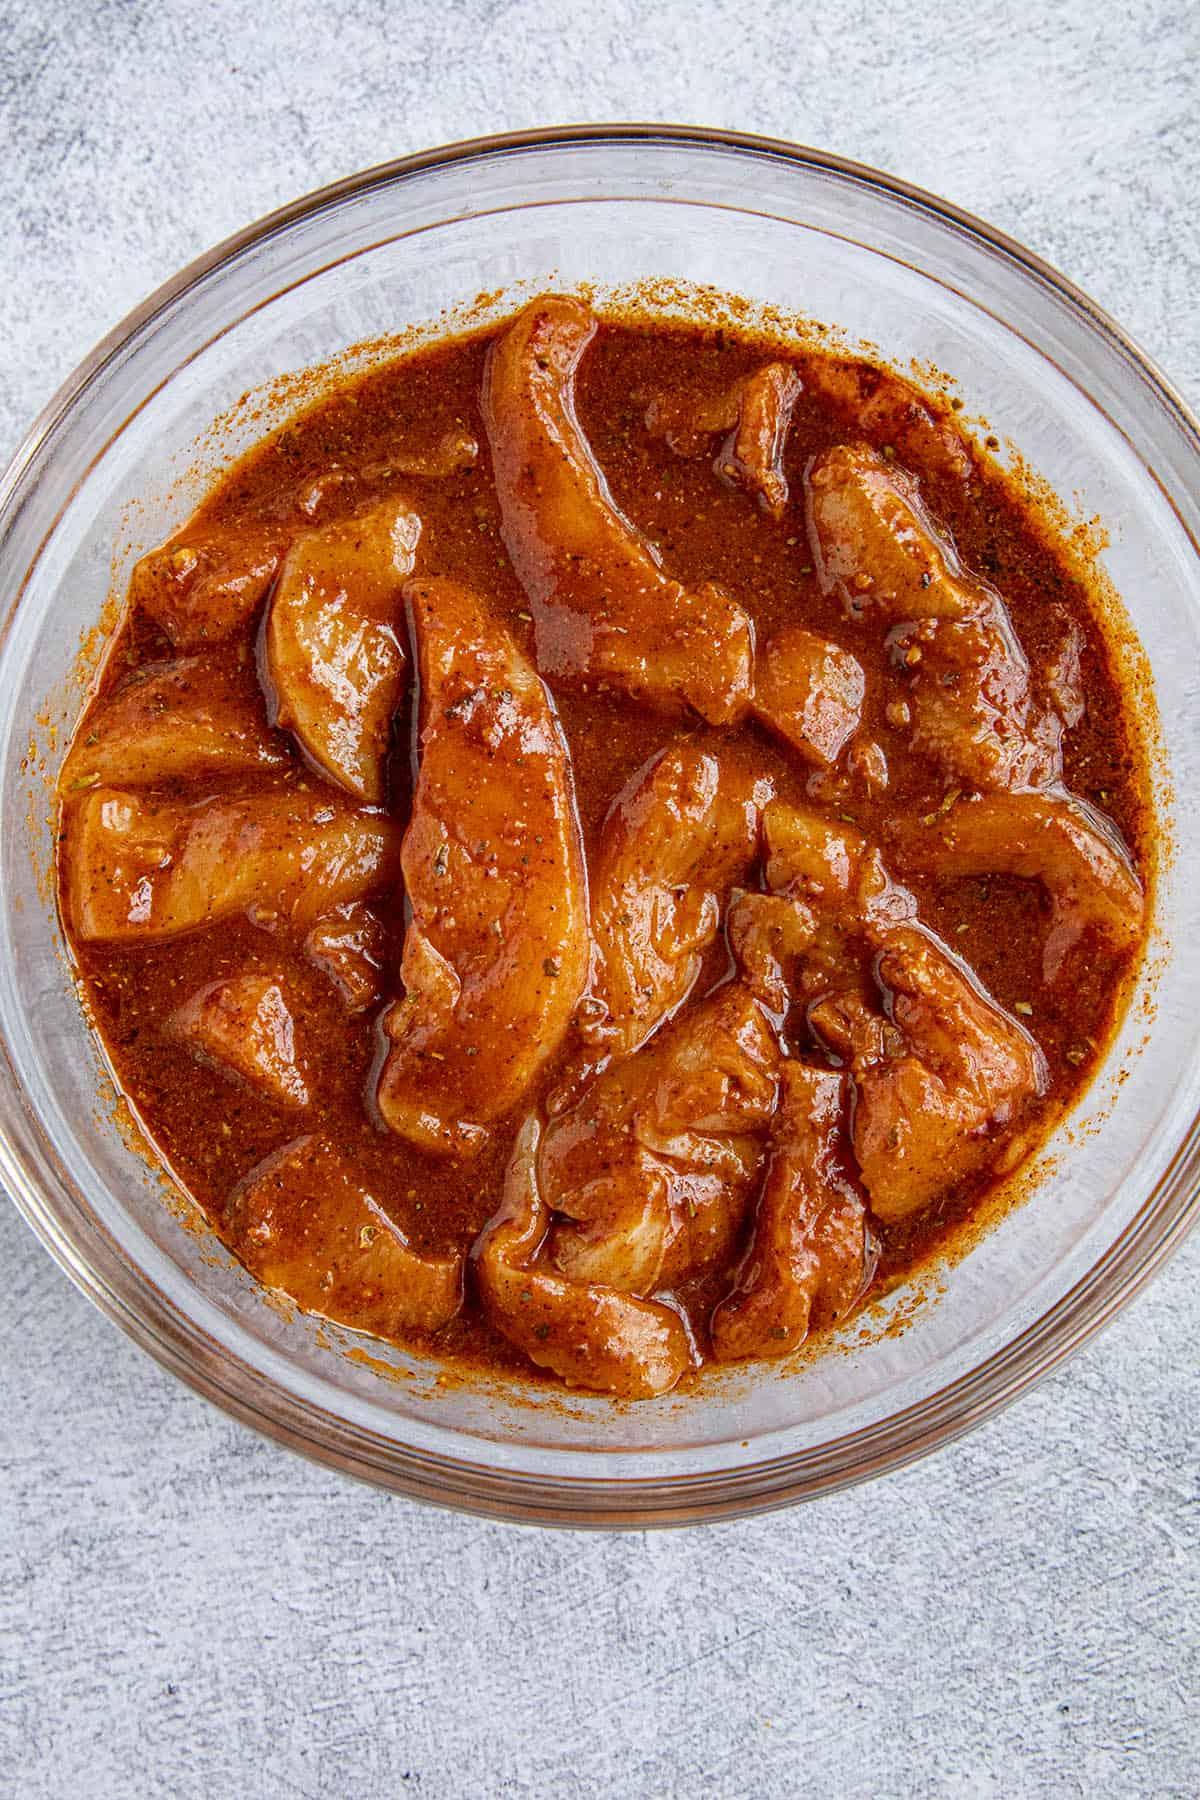 Marinated chicken for making chicken fajitas